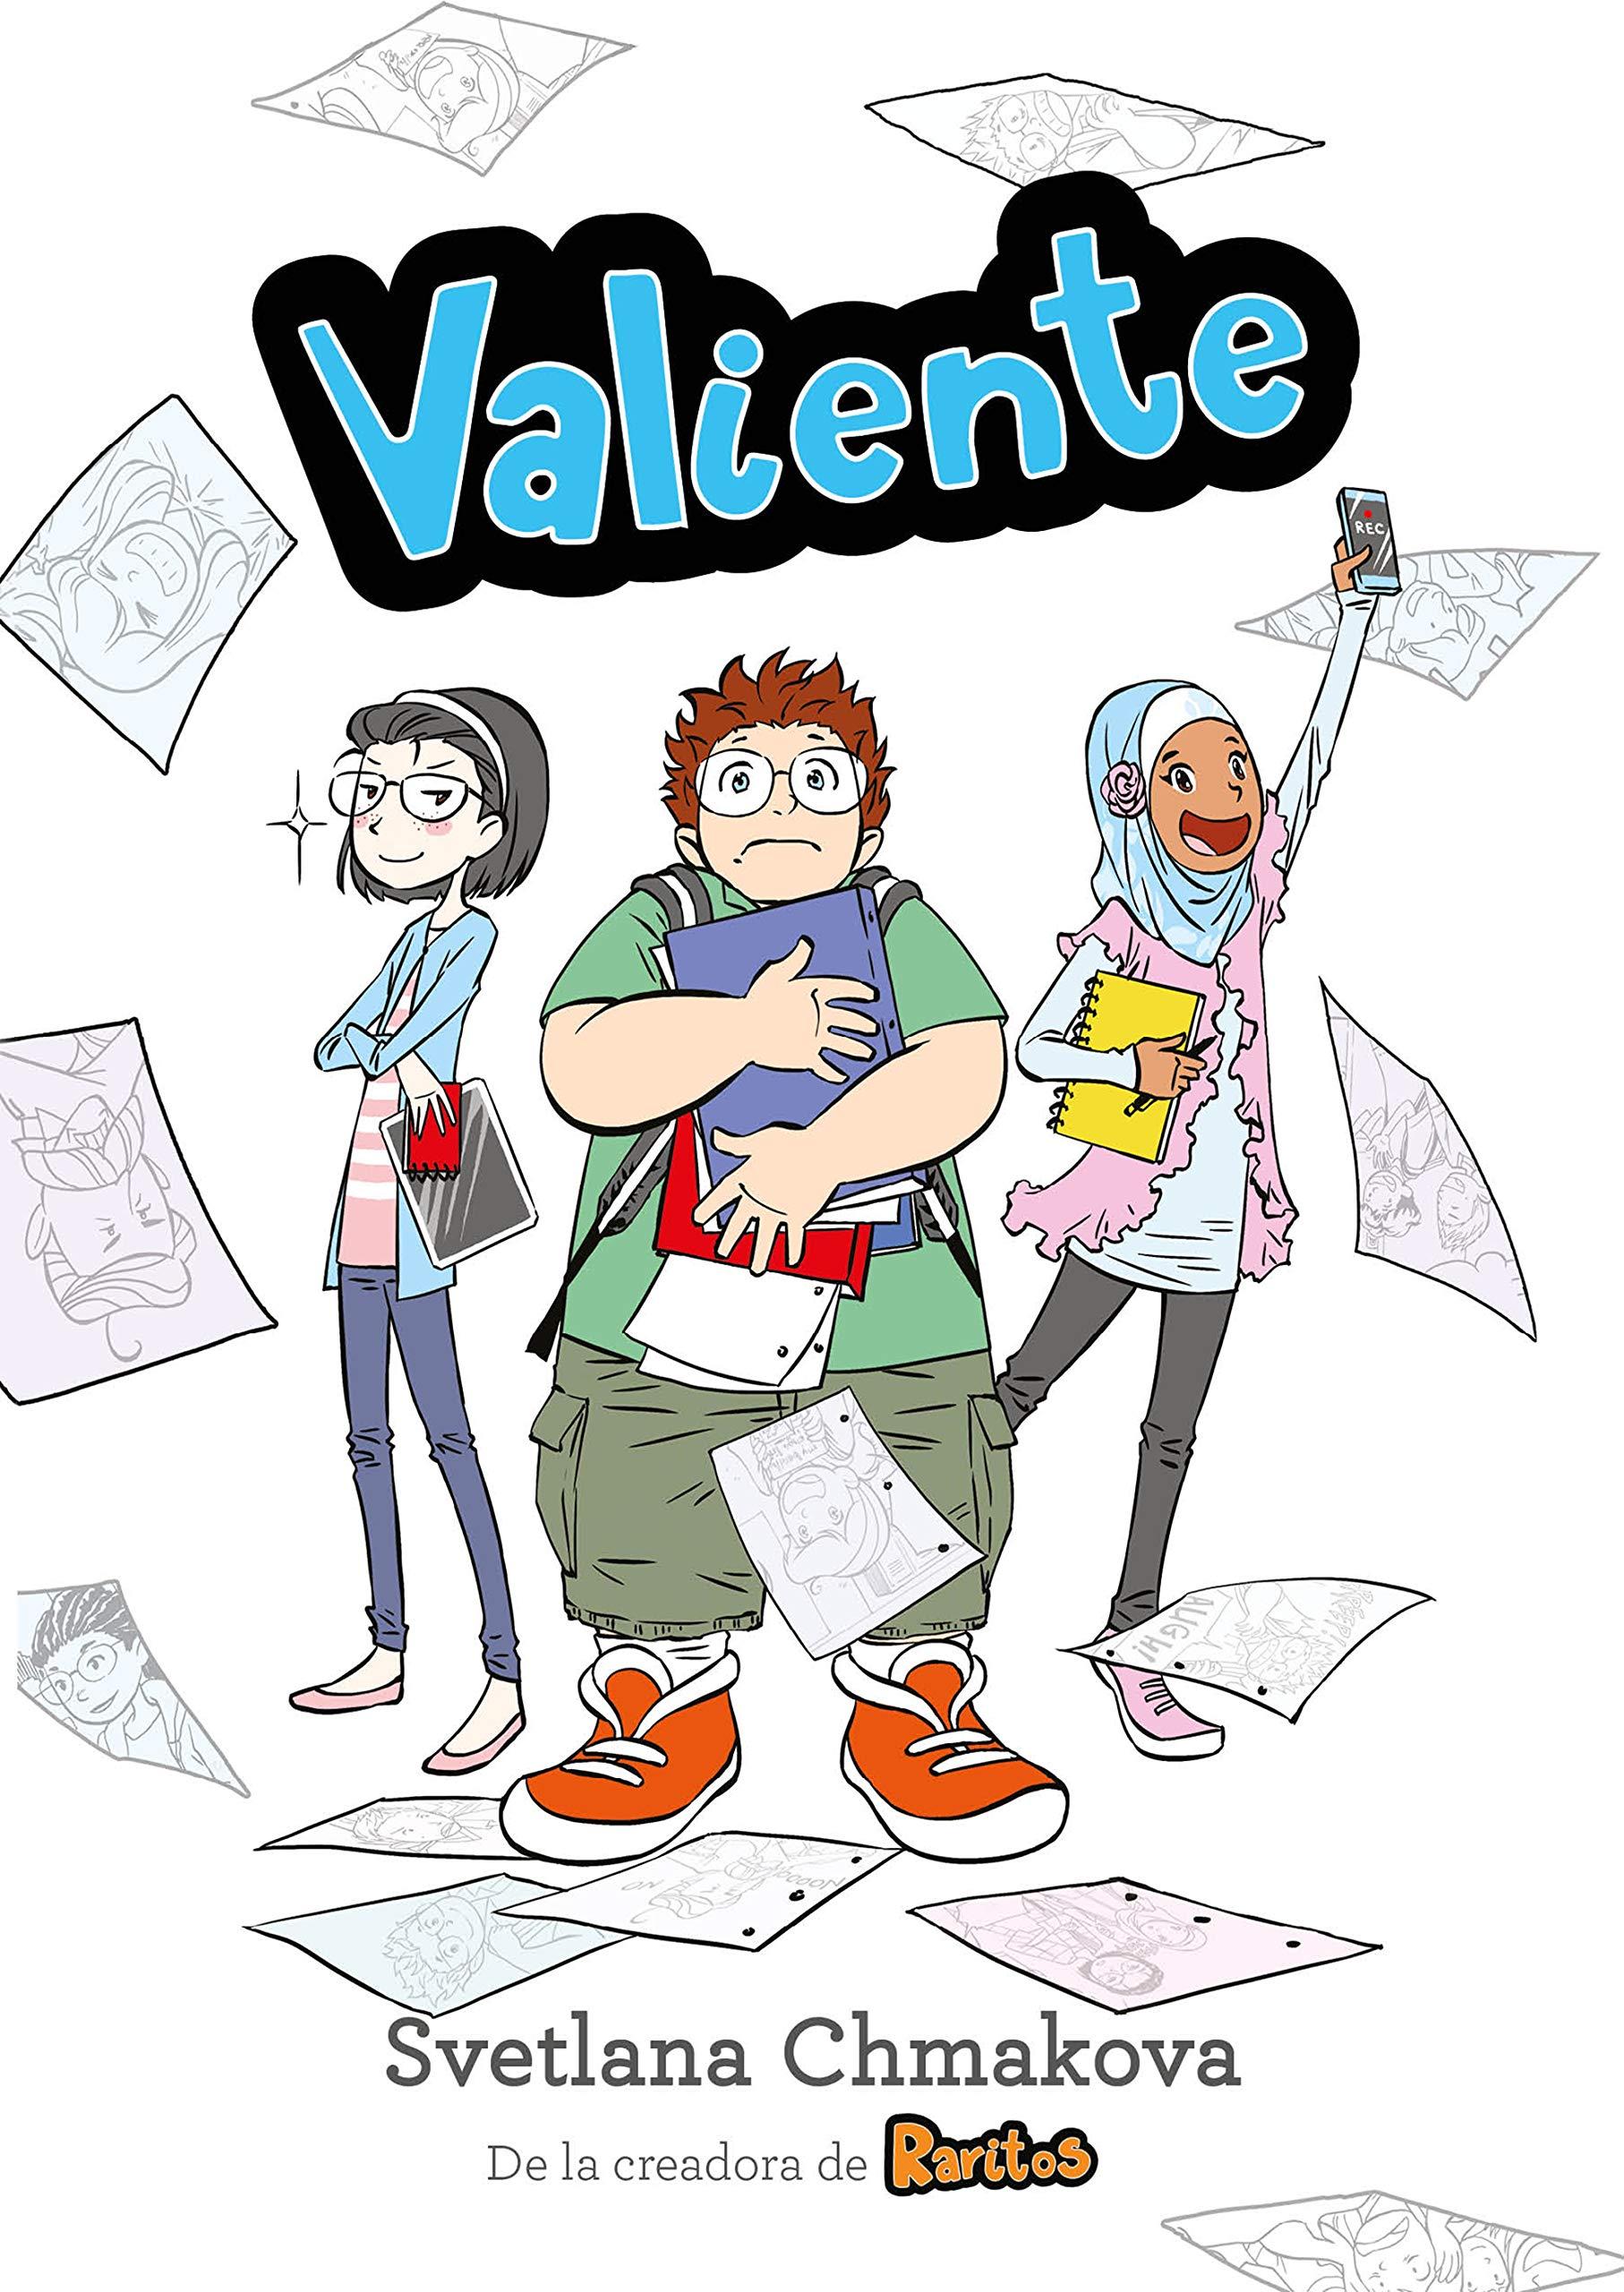 Valiente (Raritos 2) (Spanish Edition): Chmakova, Svetlana: 9788417460273:  Amazon.com: Books